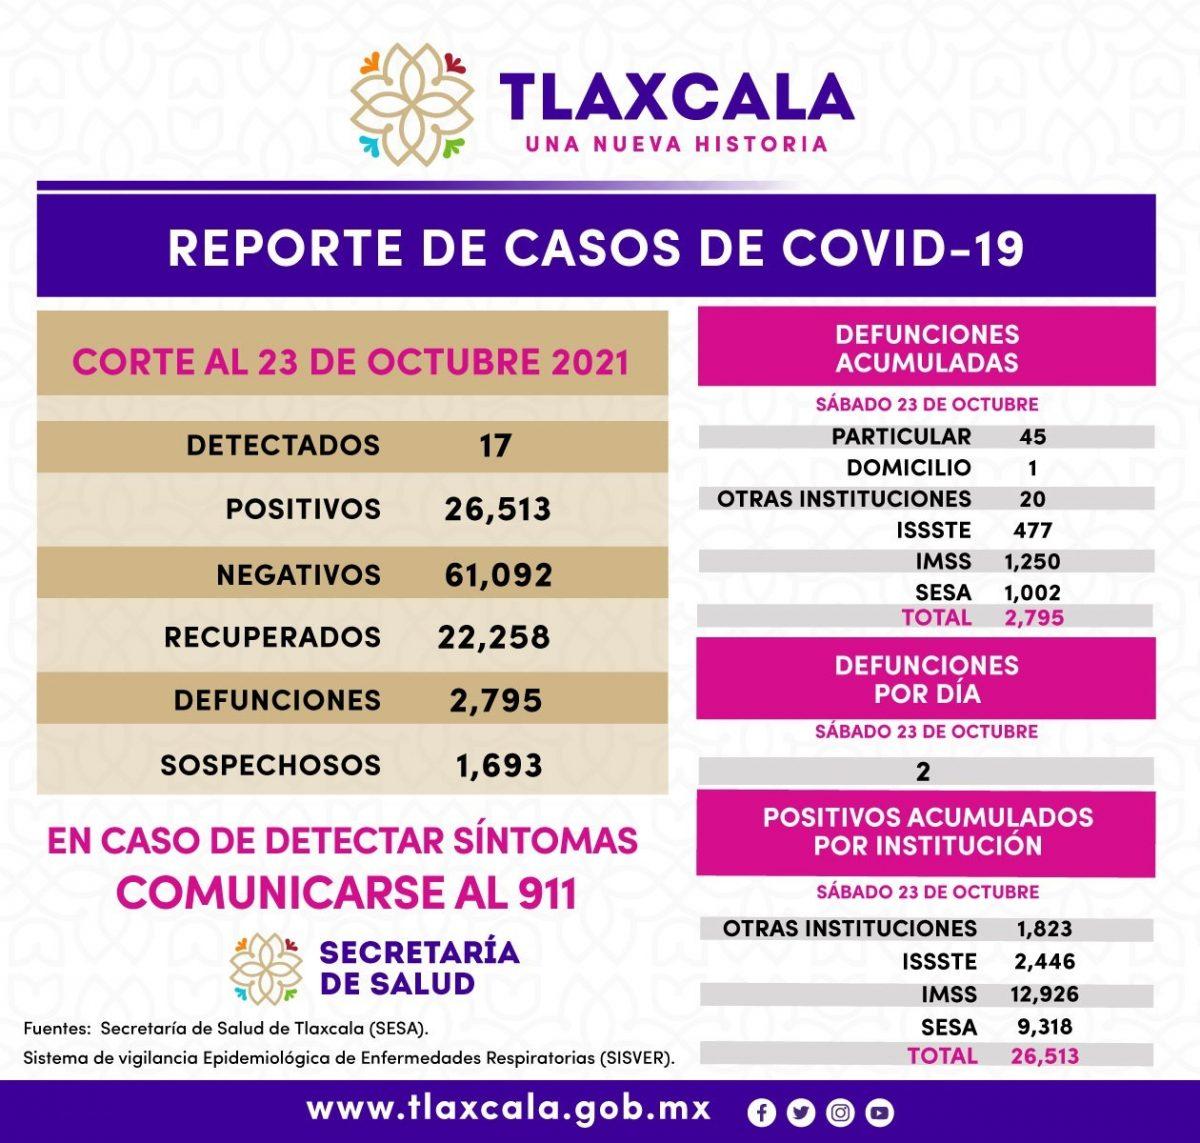 REGISTRA SESA 17 CASOS POSITIVOS DE COVID-19 EN TLAXCALA